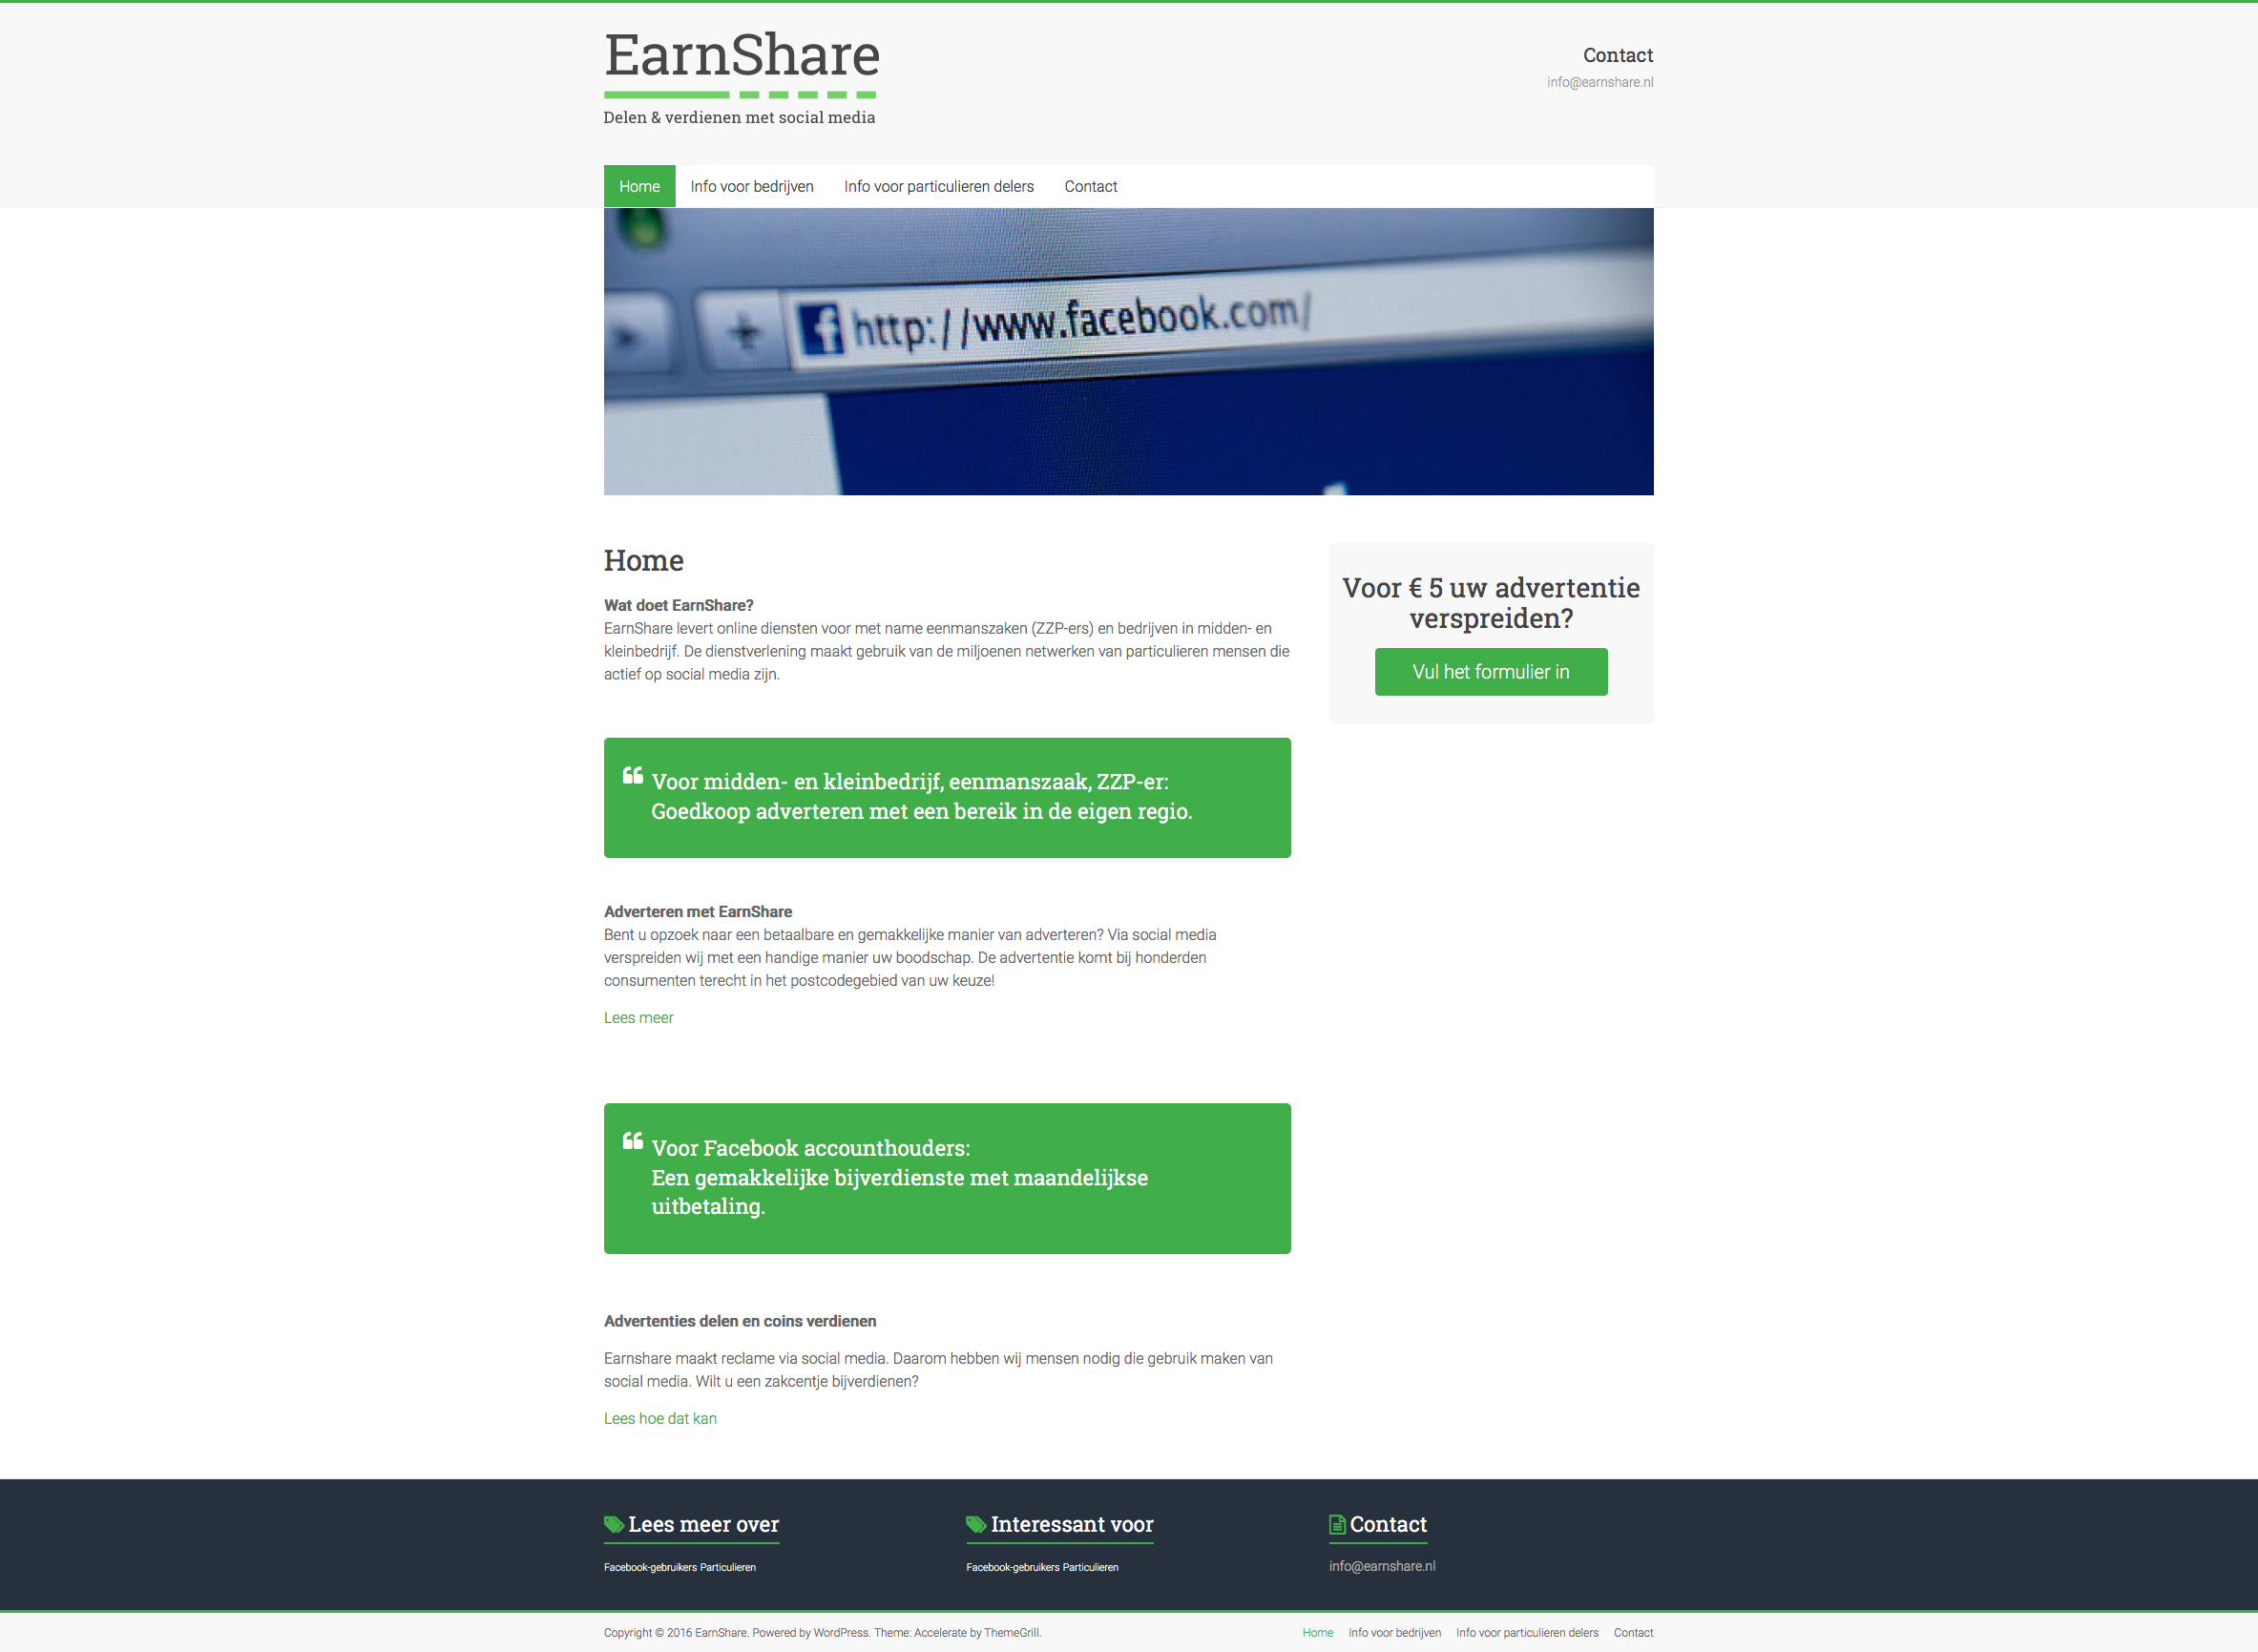 screenshot-earnshare nl 2016-02-10 21-10-05